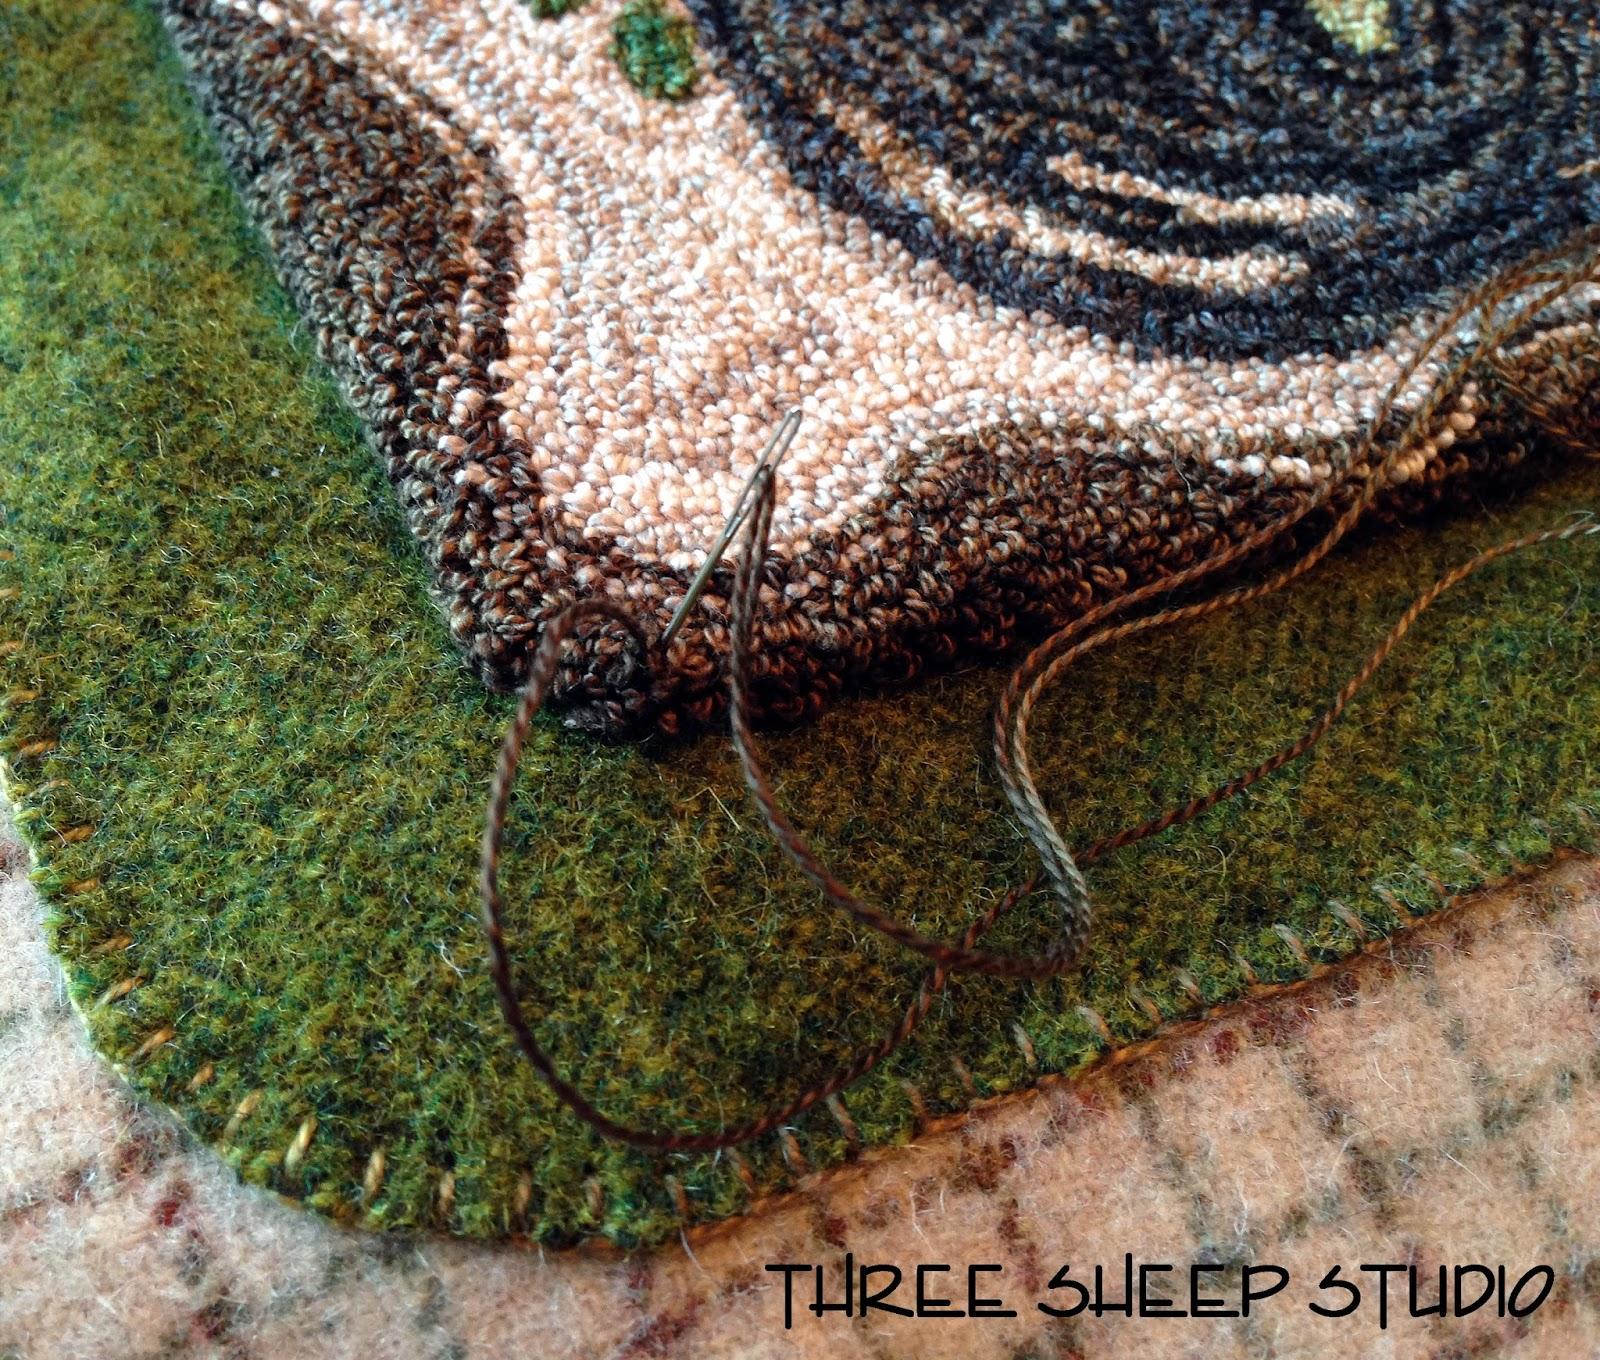 Three Sheep Studio A Punchneedle Pillow Finish